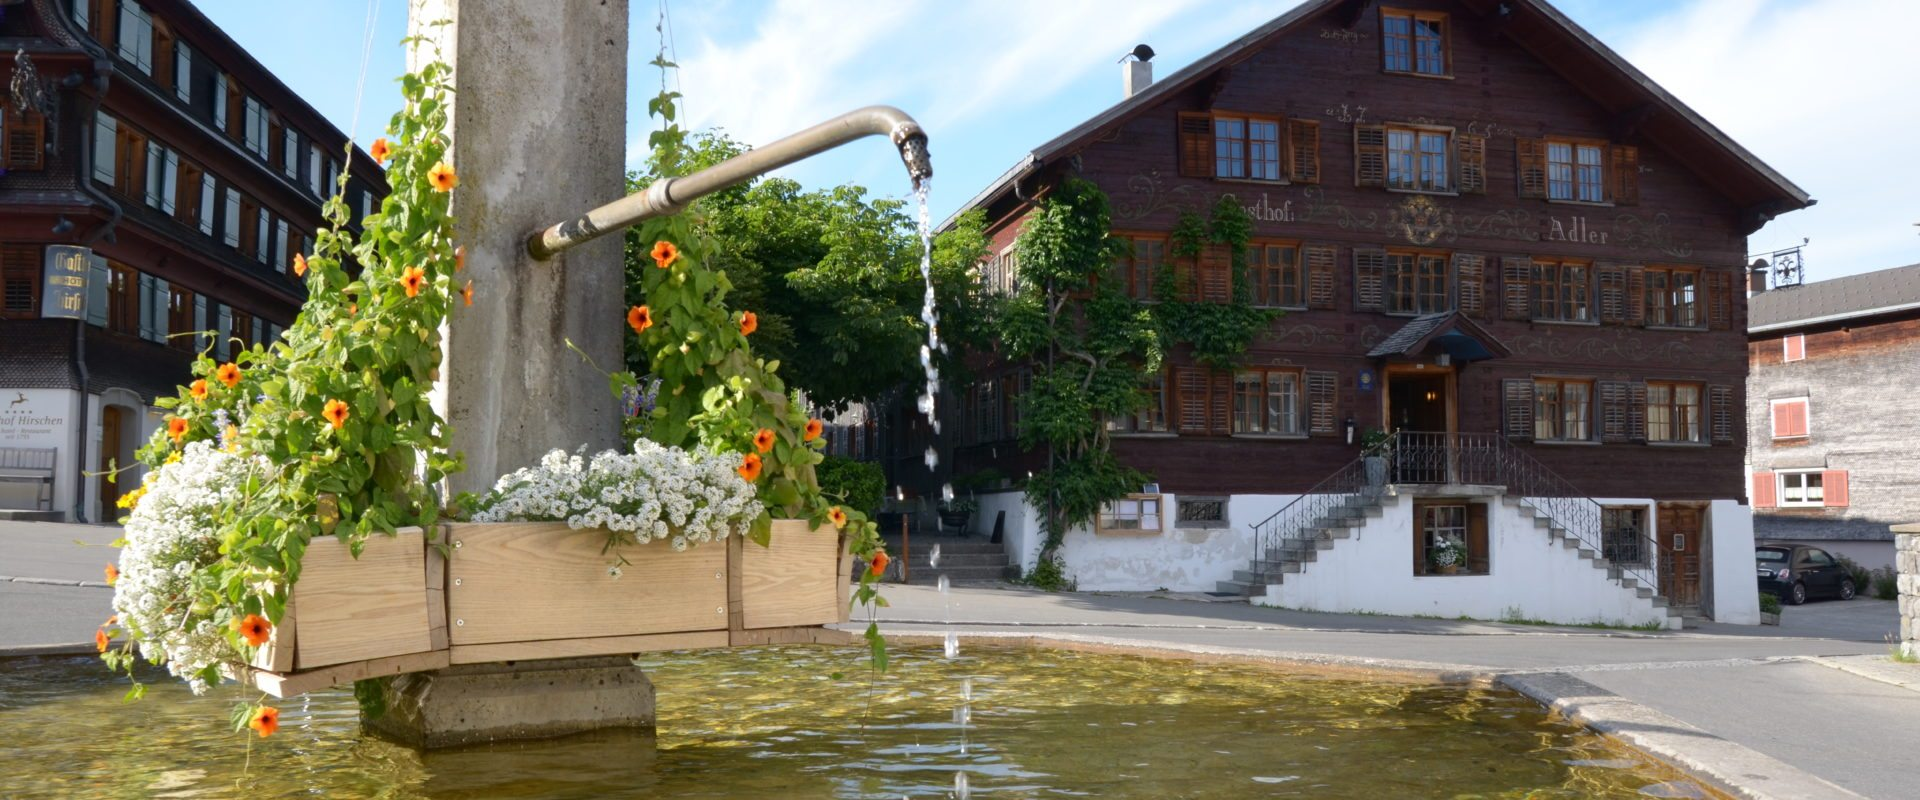 Dorfbrunnen Schwarzenberg (c)Marco J. Rusch